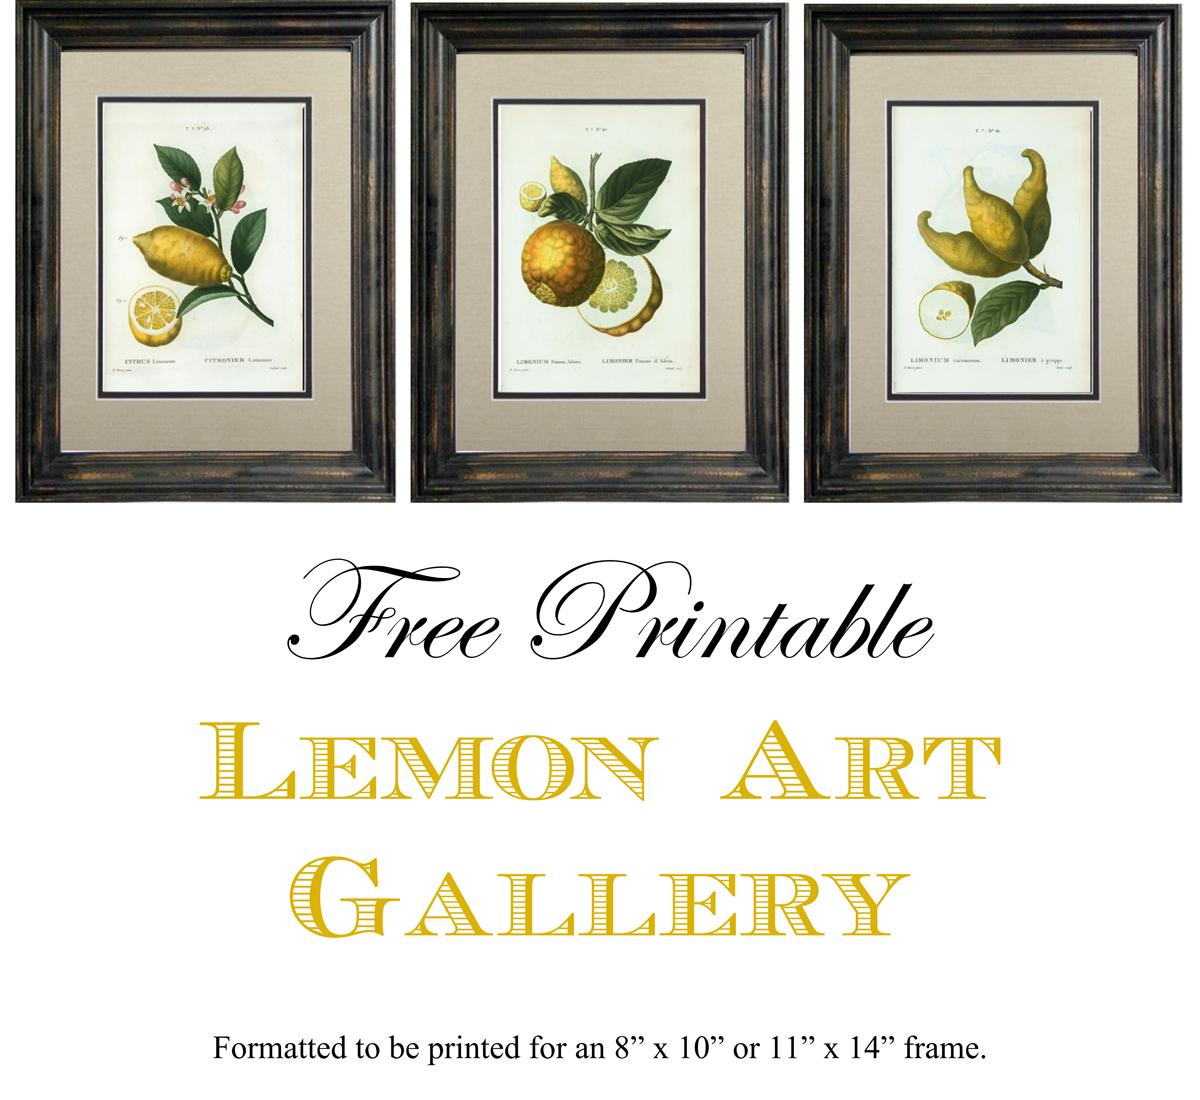 Free Printable Lemon Art - Free Printable Artwork To Frame